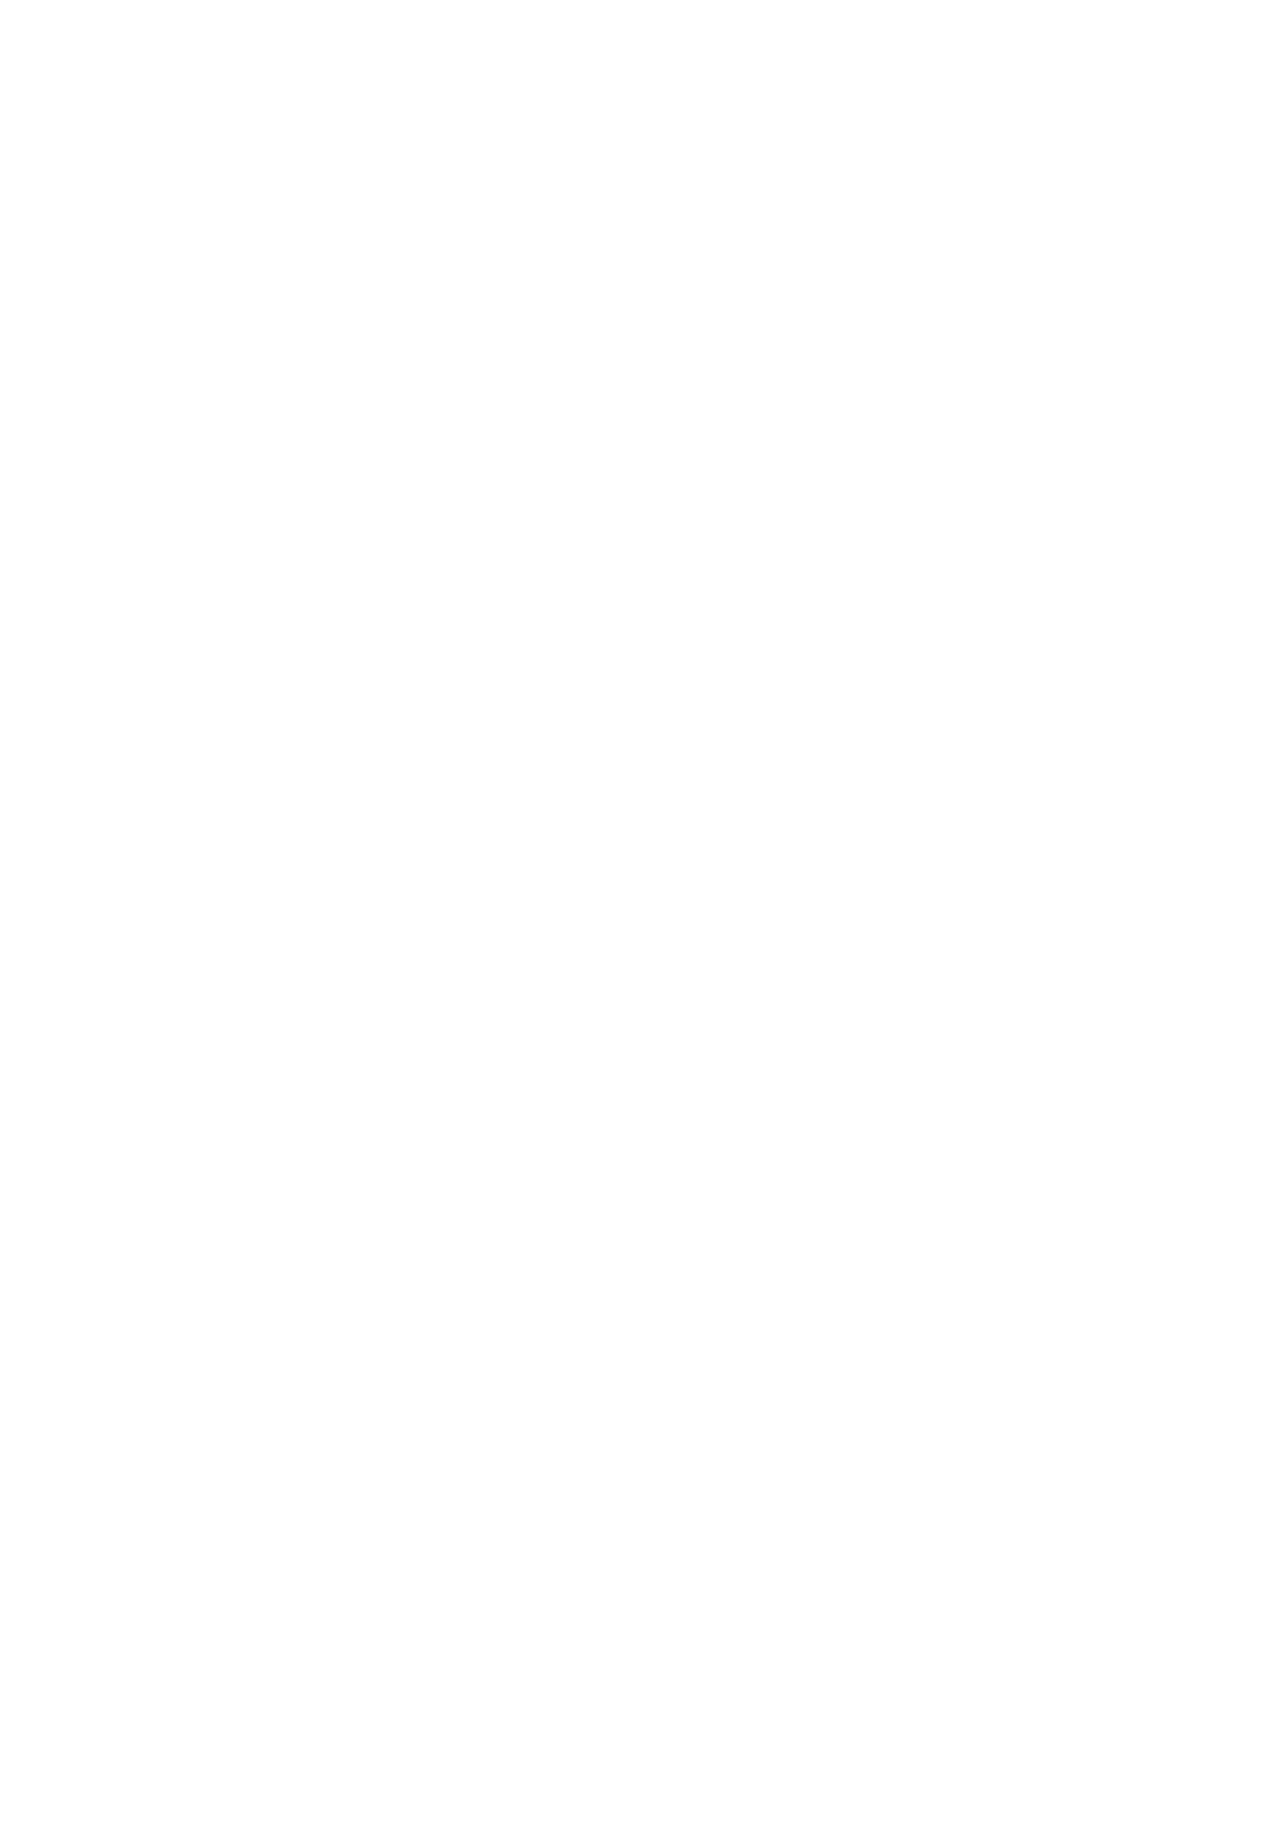 [Efuya (Messy)] Futanari Kanojo -Youshou Hen-   Futanari Girlfriend -Childhood Edition- [English] [q91] [Digital] 1